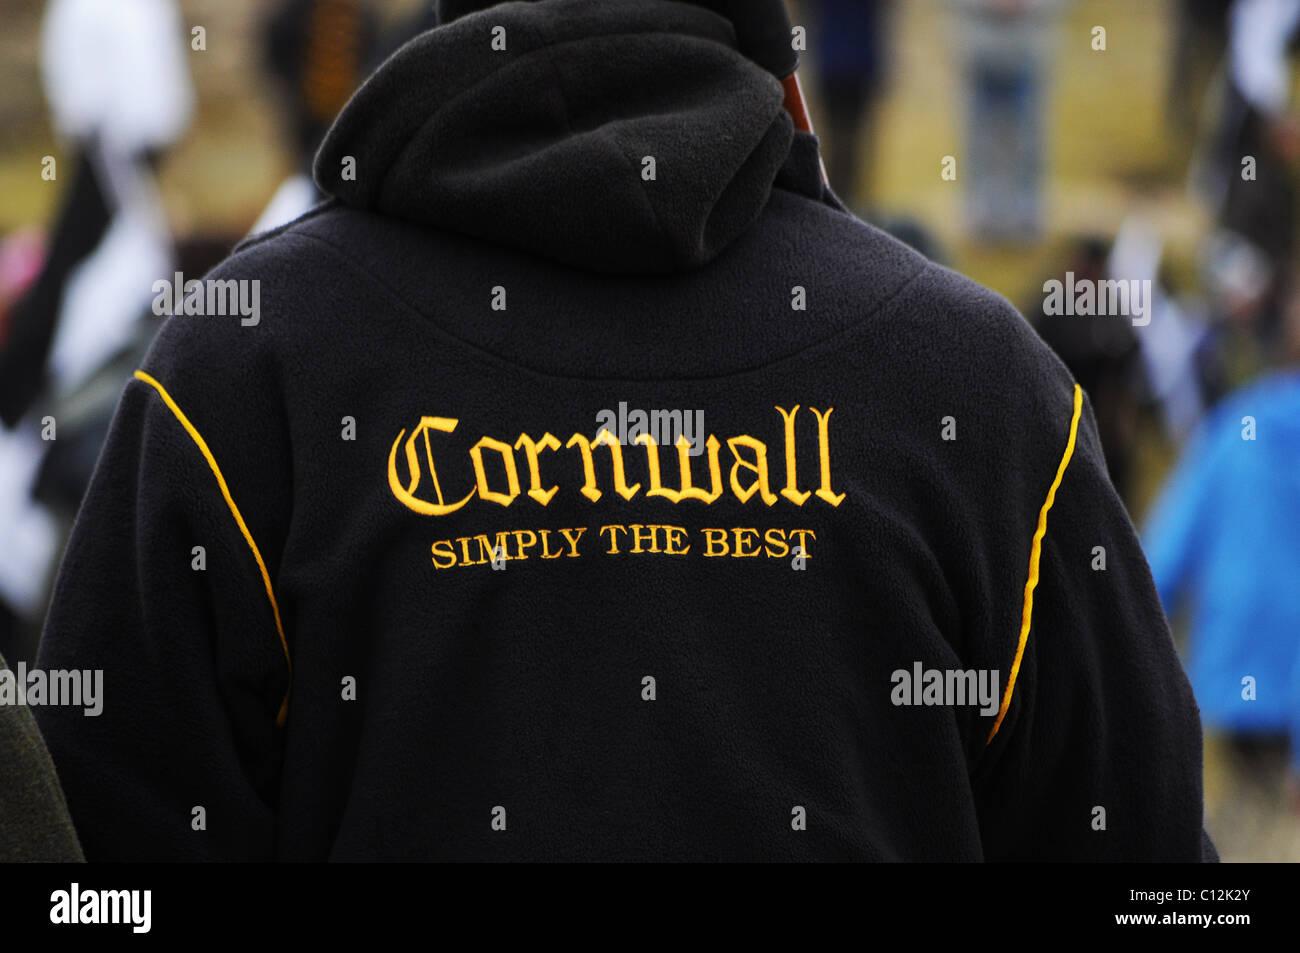 A cornwall rugby sostenitore Immagini Stock